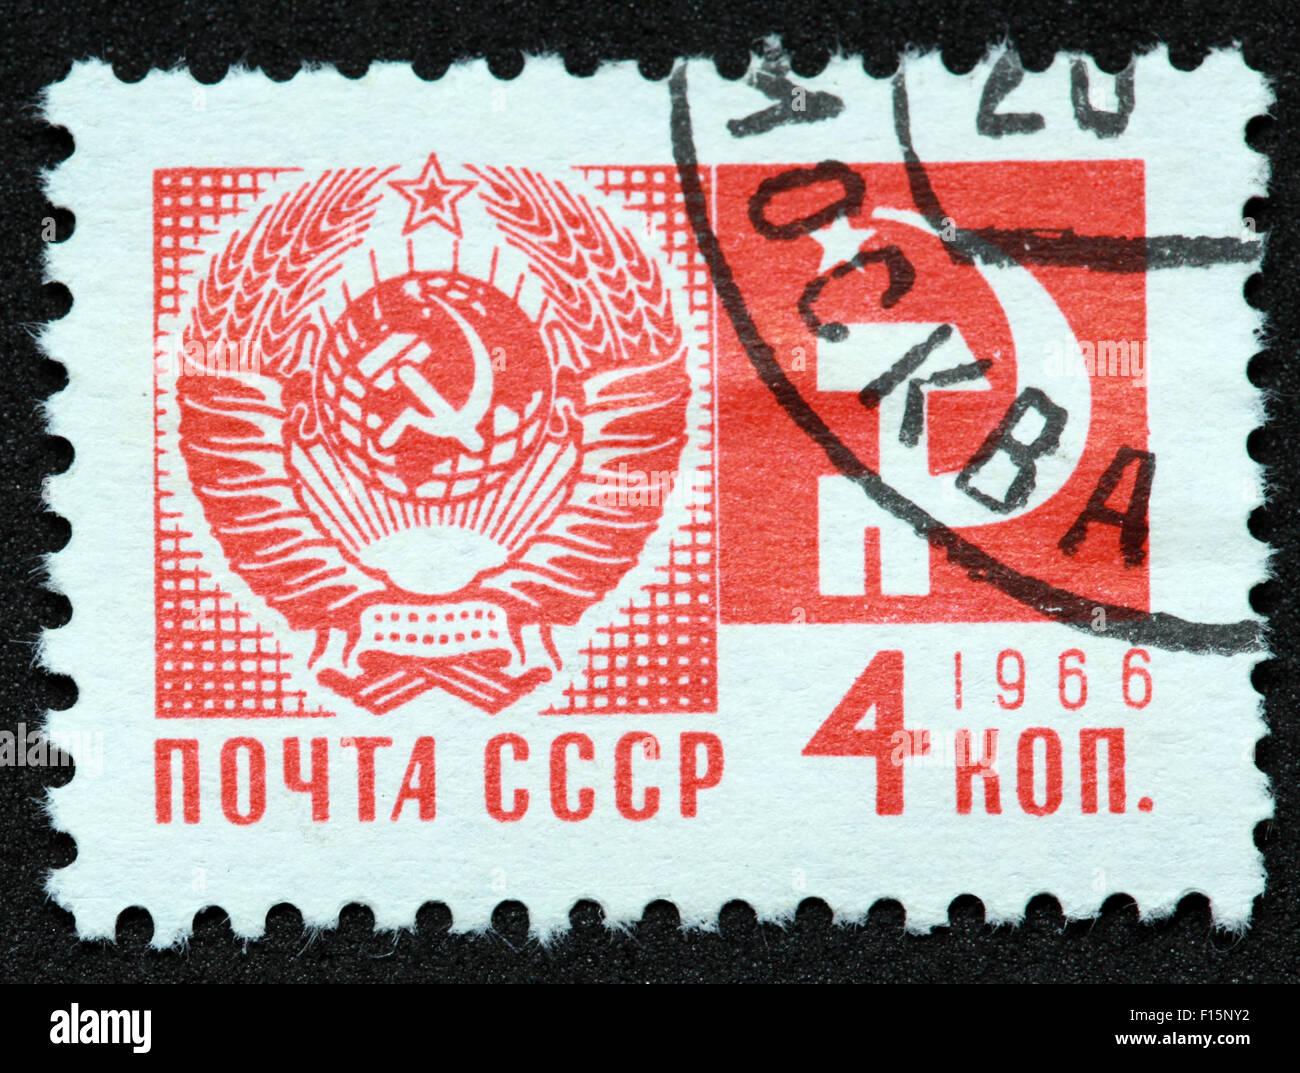 4 Kon Kopek Mockba 1966 CCCP  USSR space stamps - Stock Image